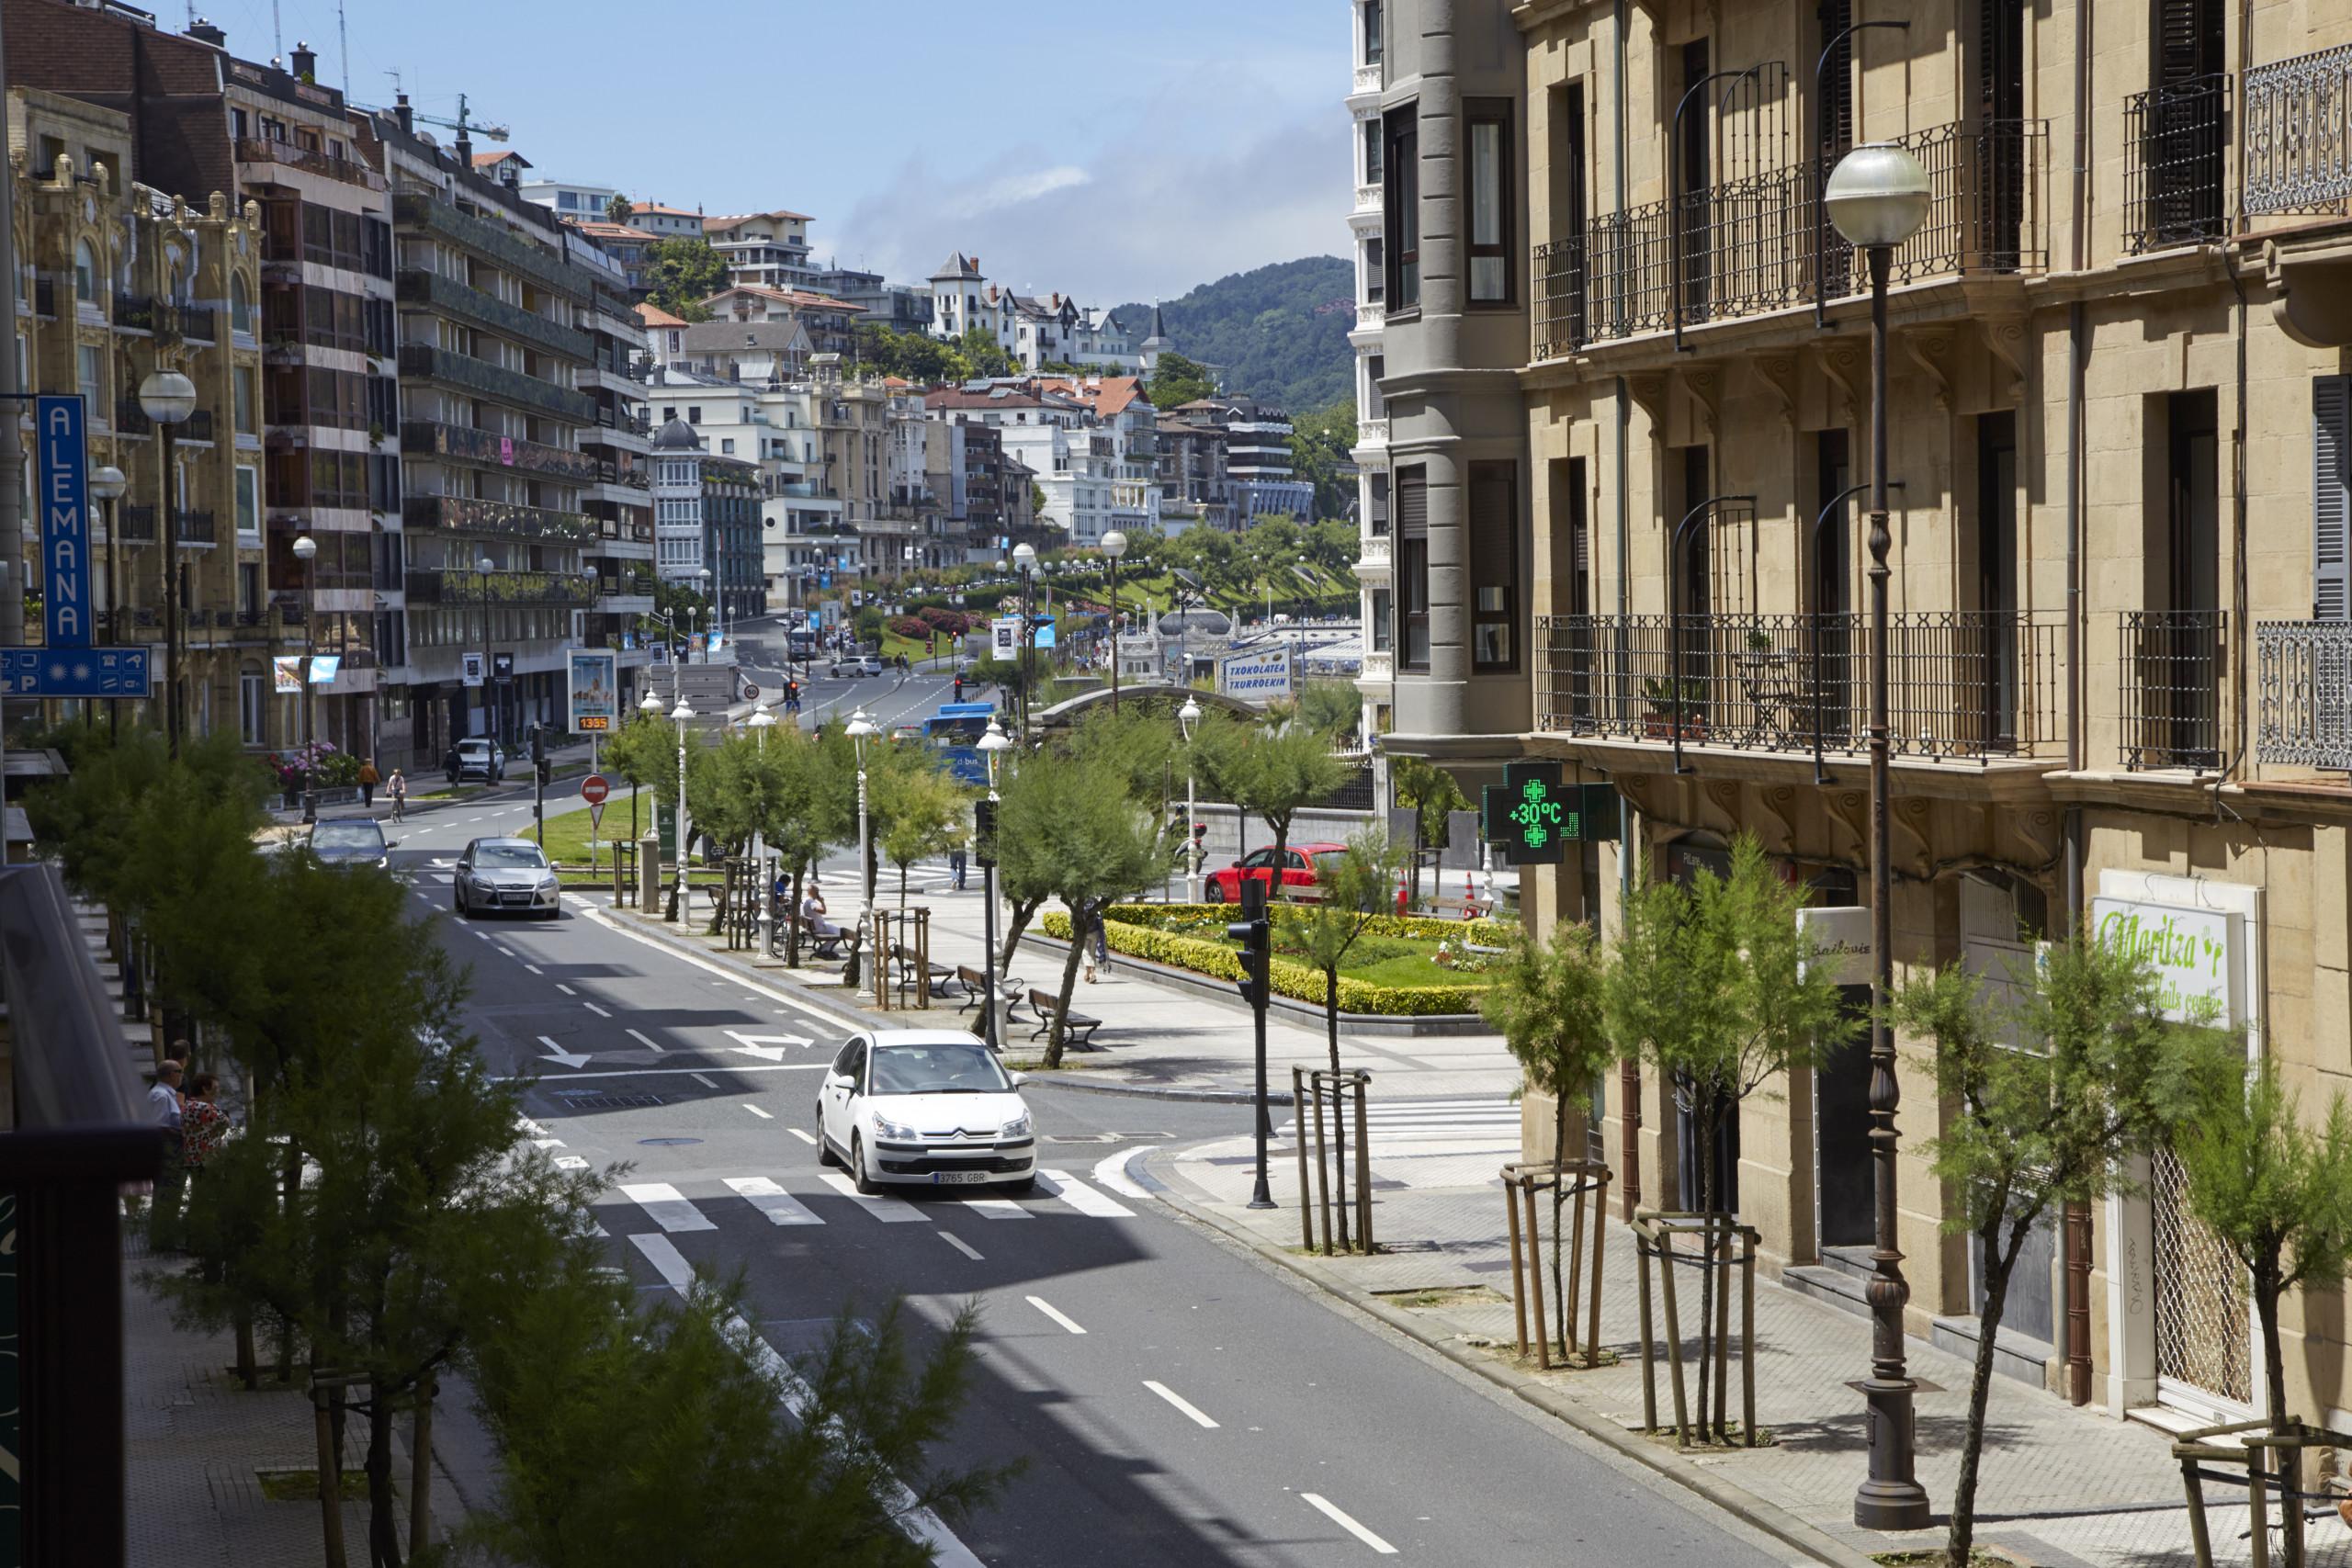 HURBIL - Basque Stay - Apartments in San Sebastián